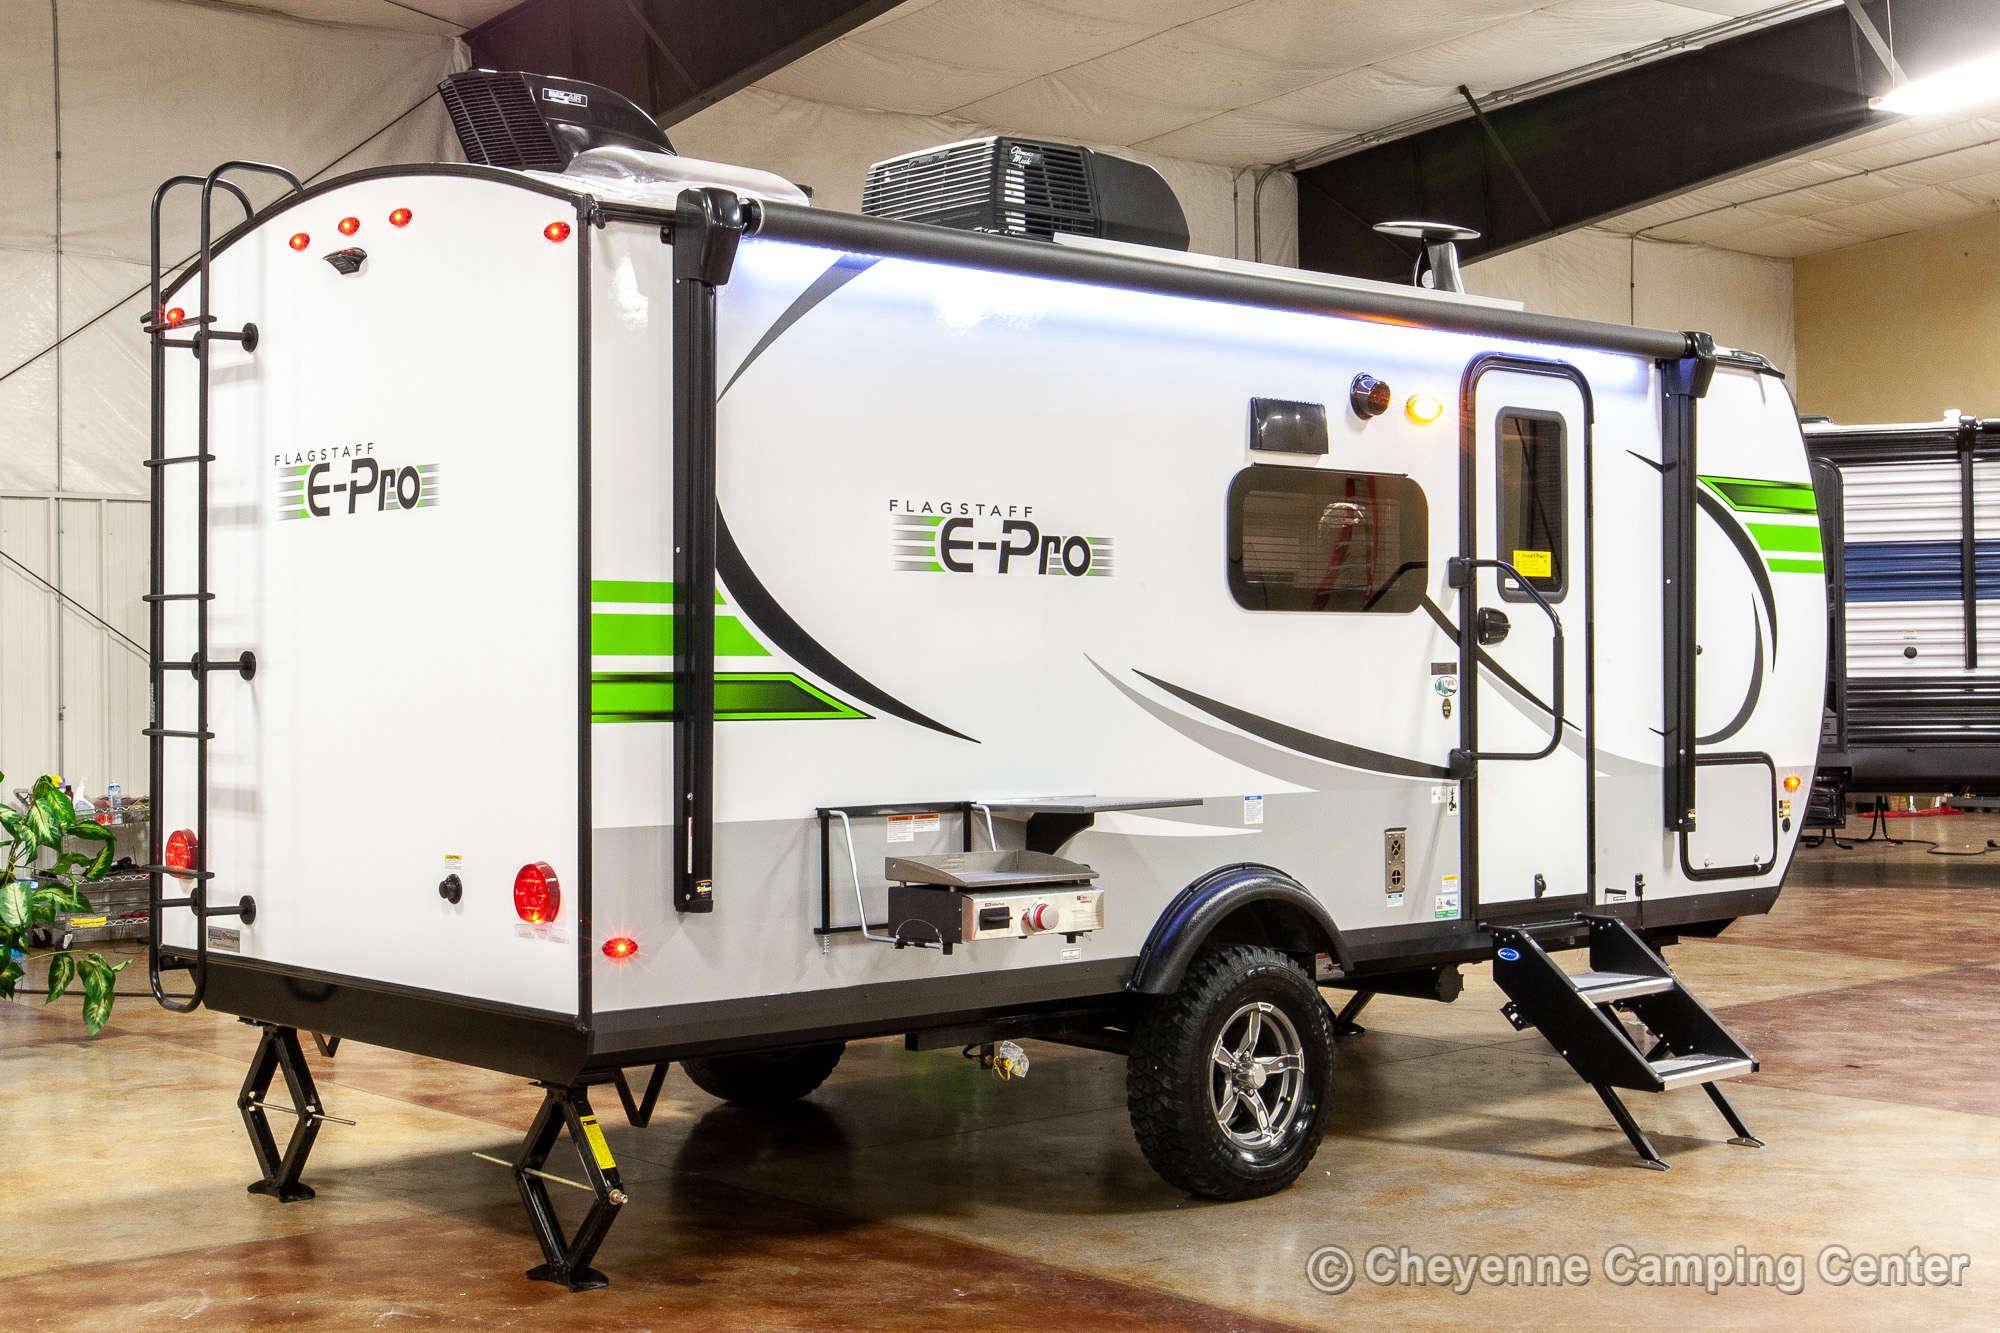 2022 Forest River Flagstaff E-Pro E20BHS Bunkhouse Travel Trailer Exterior Image